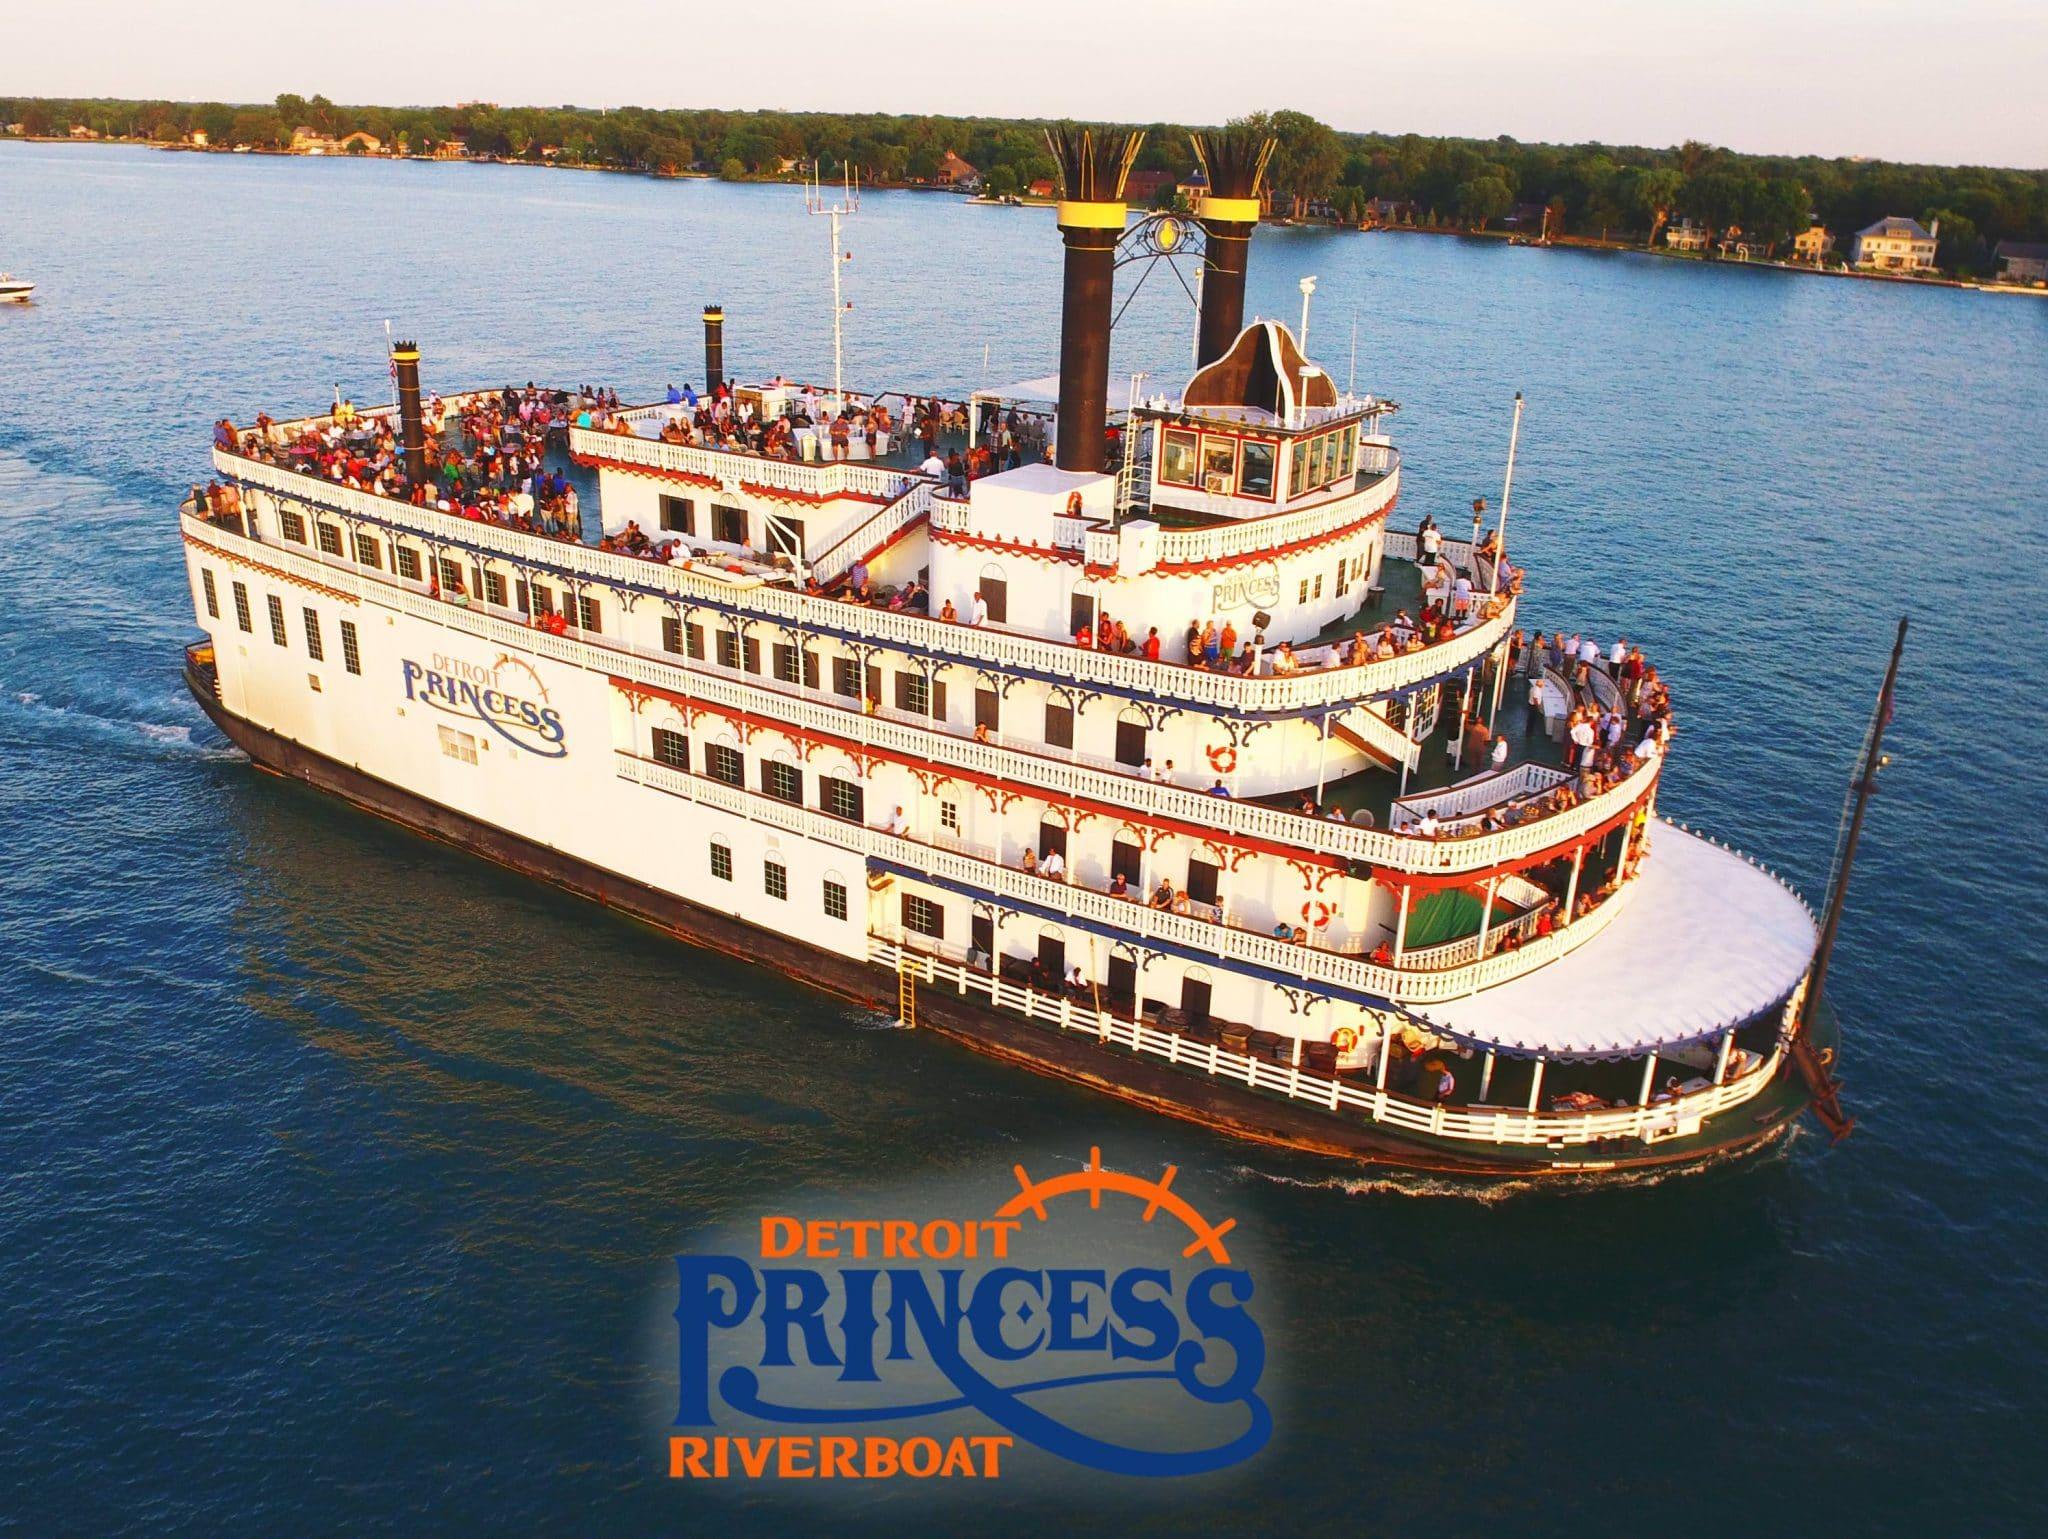 11Detroit Princess Riverboat with passengers